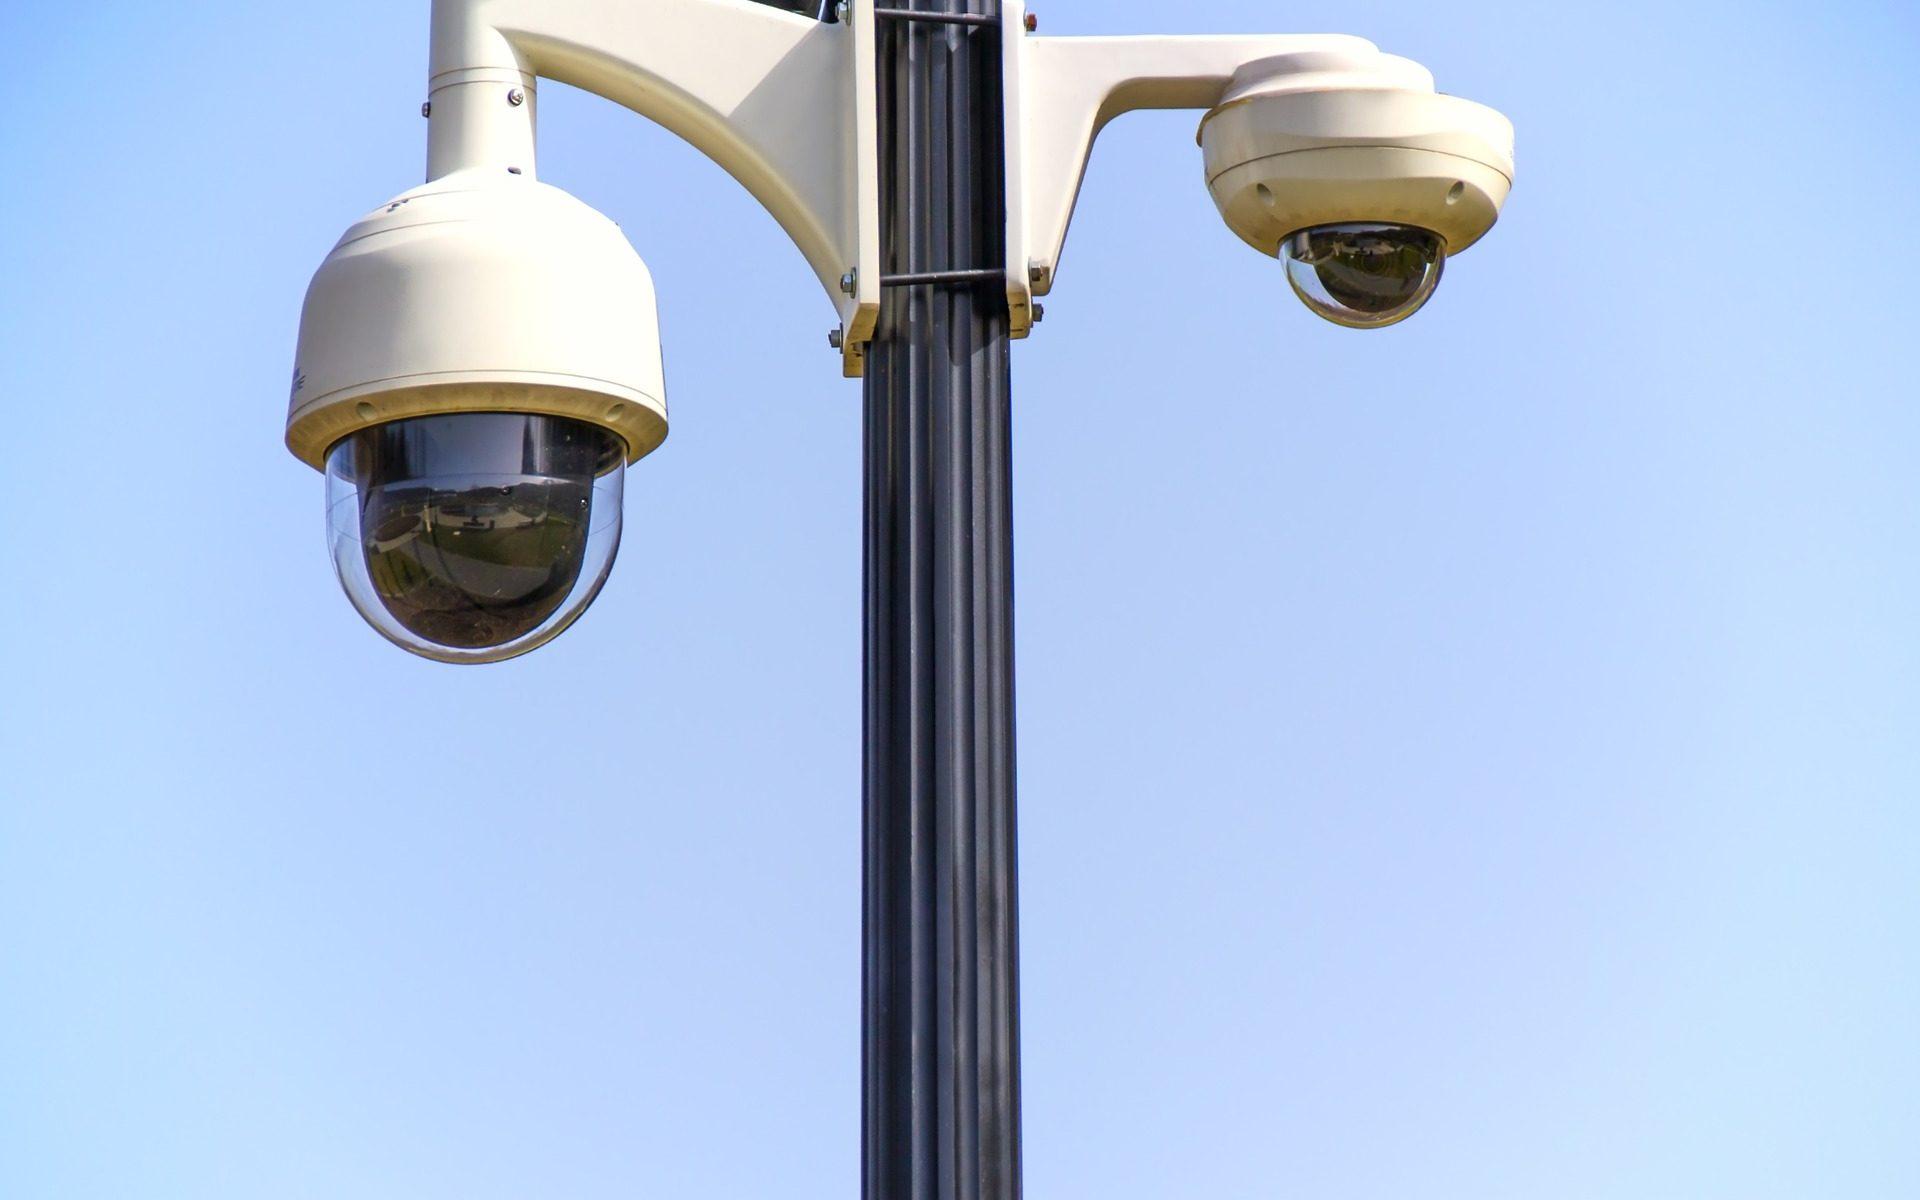 Big Brother is watching you - Transparenz an allen Orten